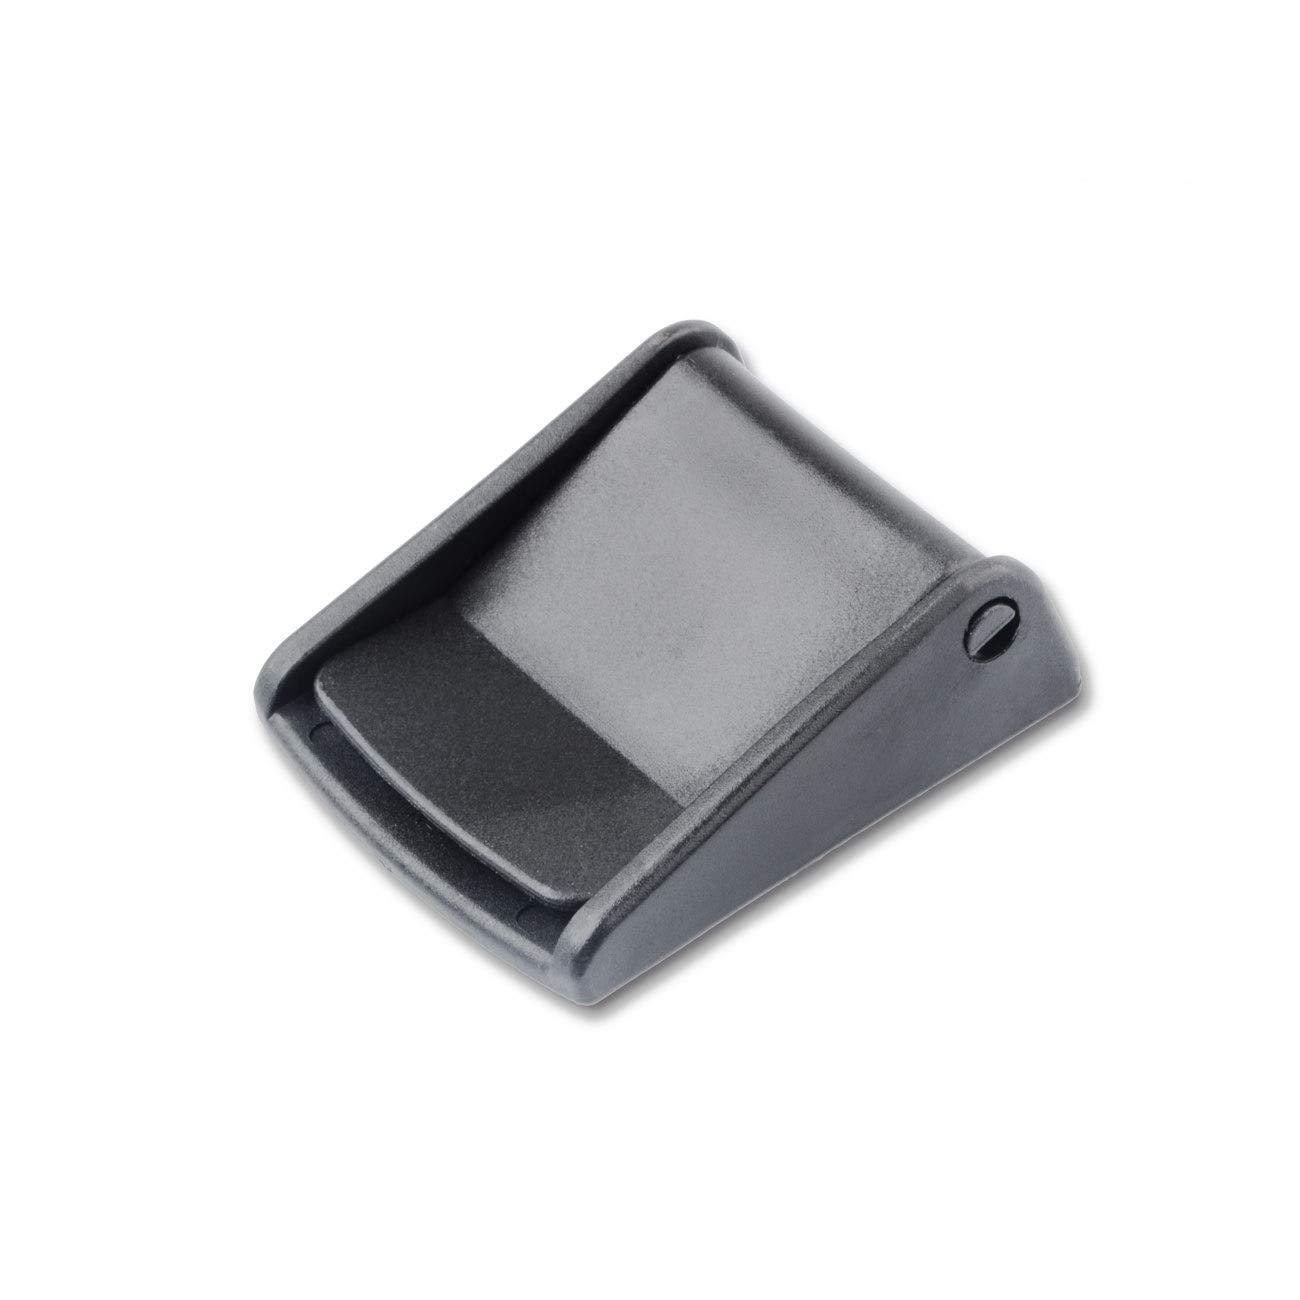 2PCS,32mm Multi-Size Cam Buckle Webbing Buckle Plastic Adjustable Buckles Toggle Clip